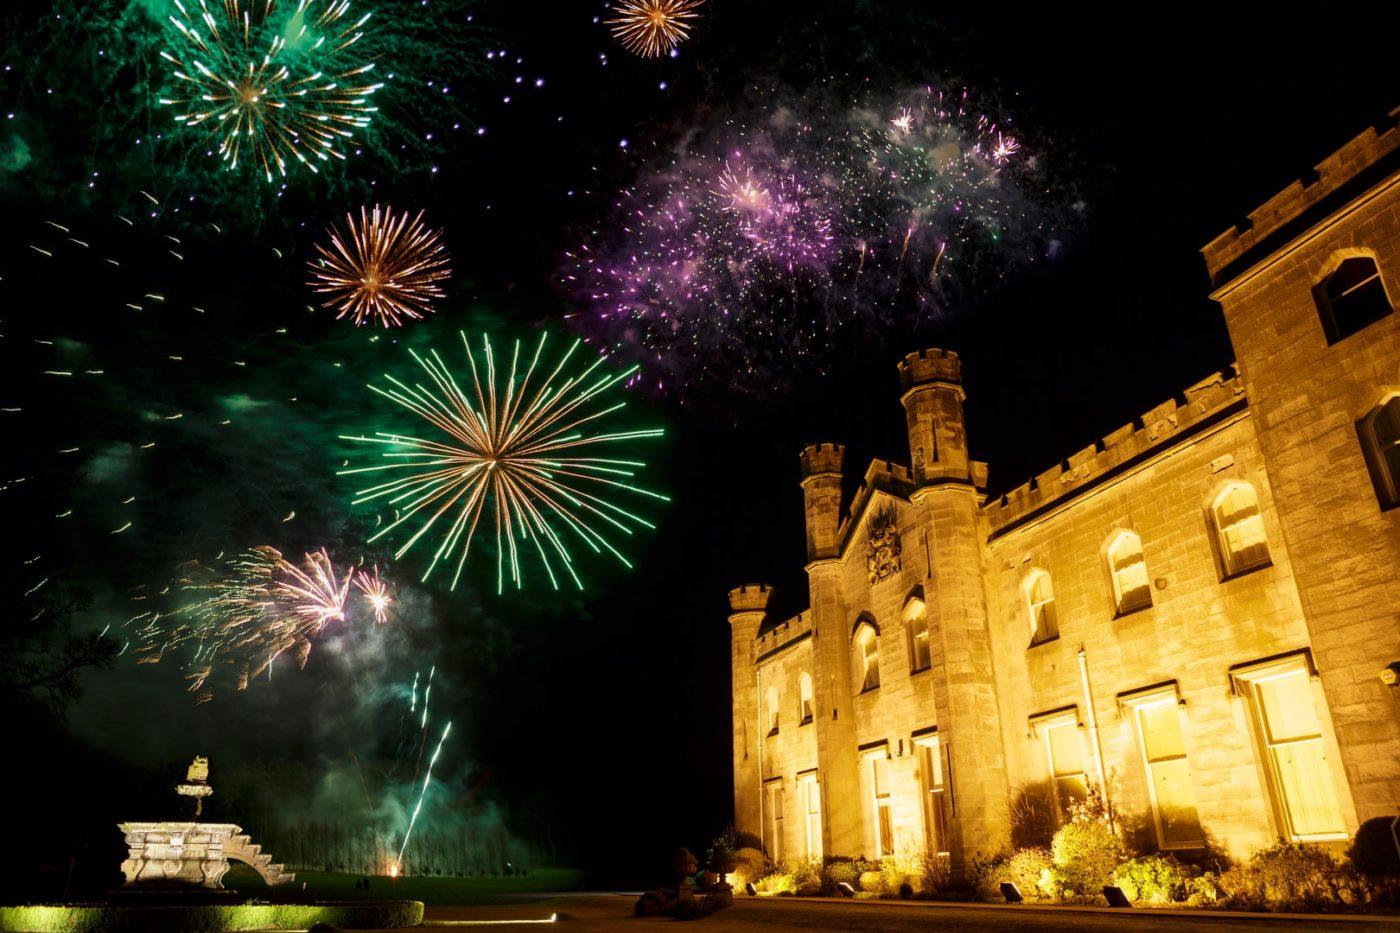 Pr agency Edinburgh, celebrating Hogmanay New Year 2020 in Edinburgh at Dundas Castle, events and wedding private venue, Scottish Castle